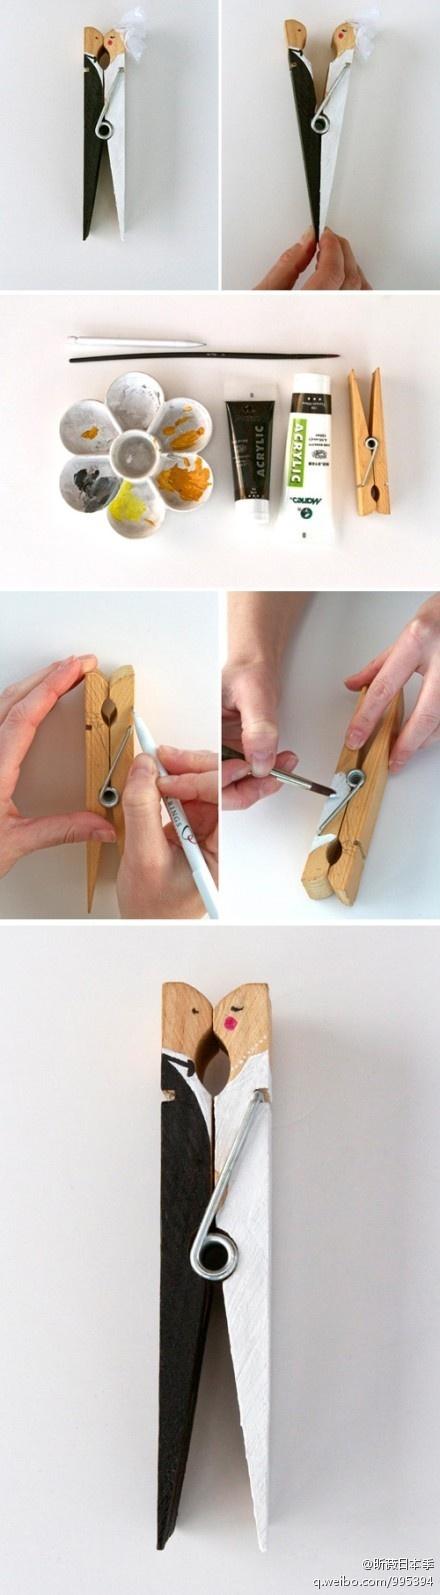 hahahahahhaahahaha!! so doing this to allll my clothes pins!!!!!!